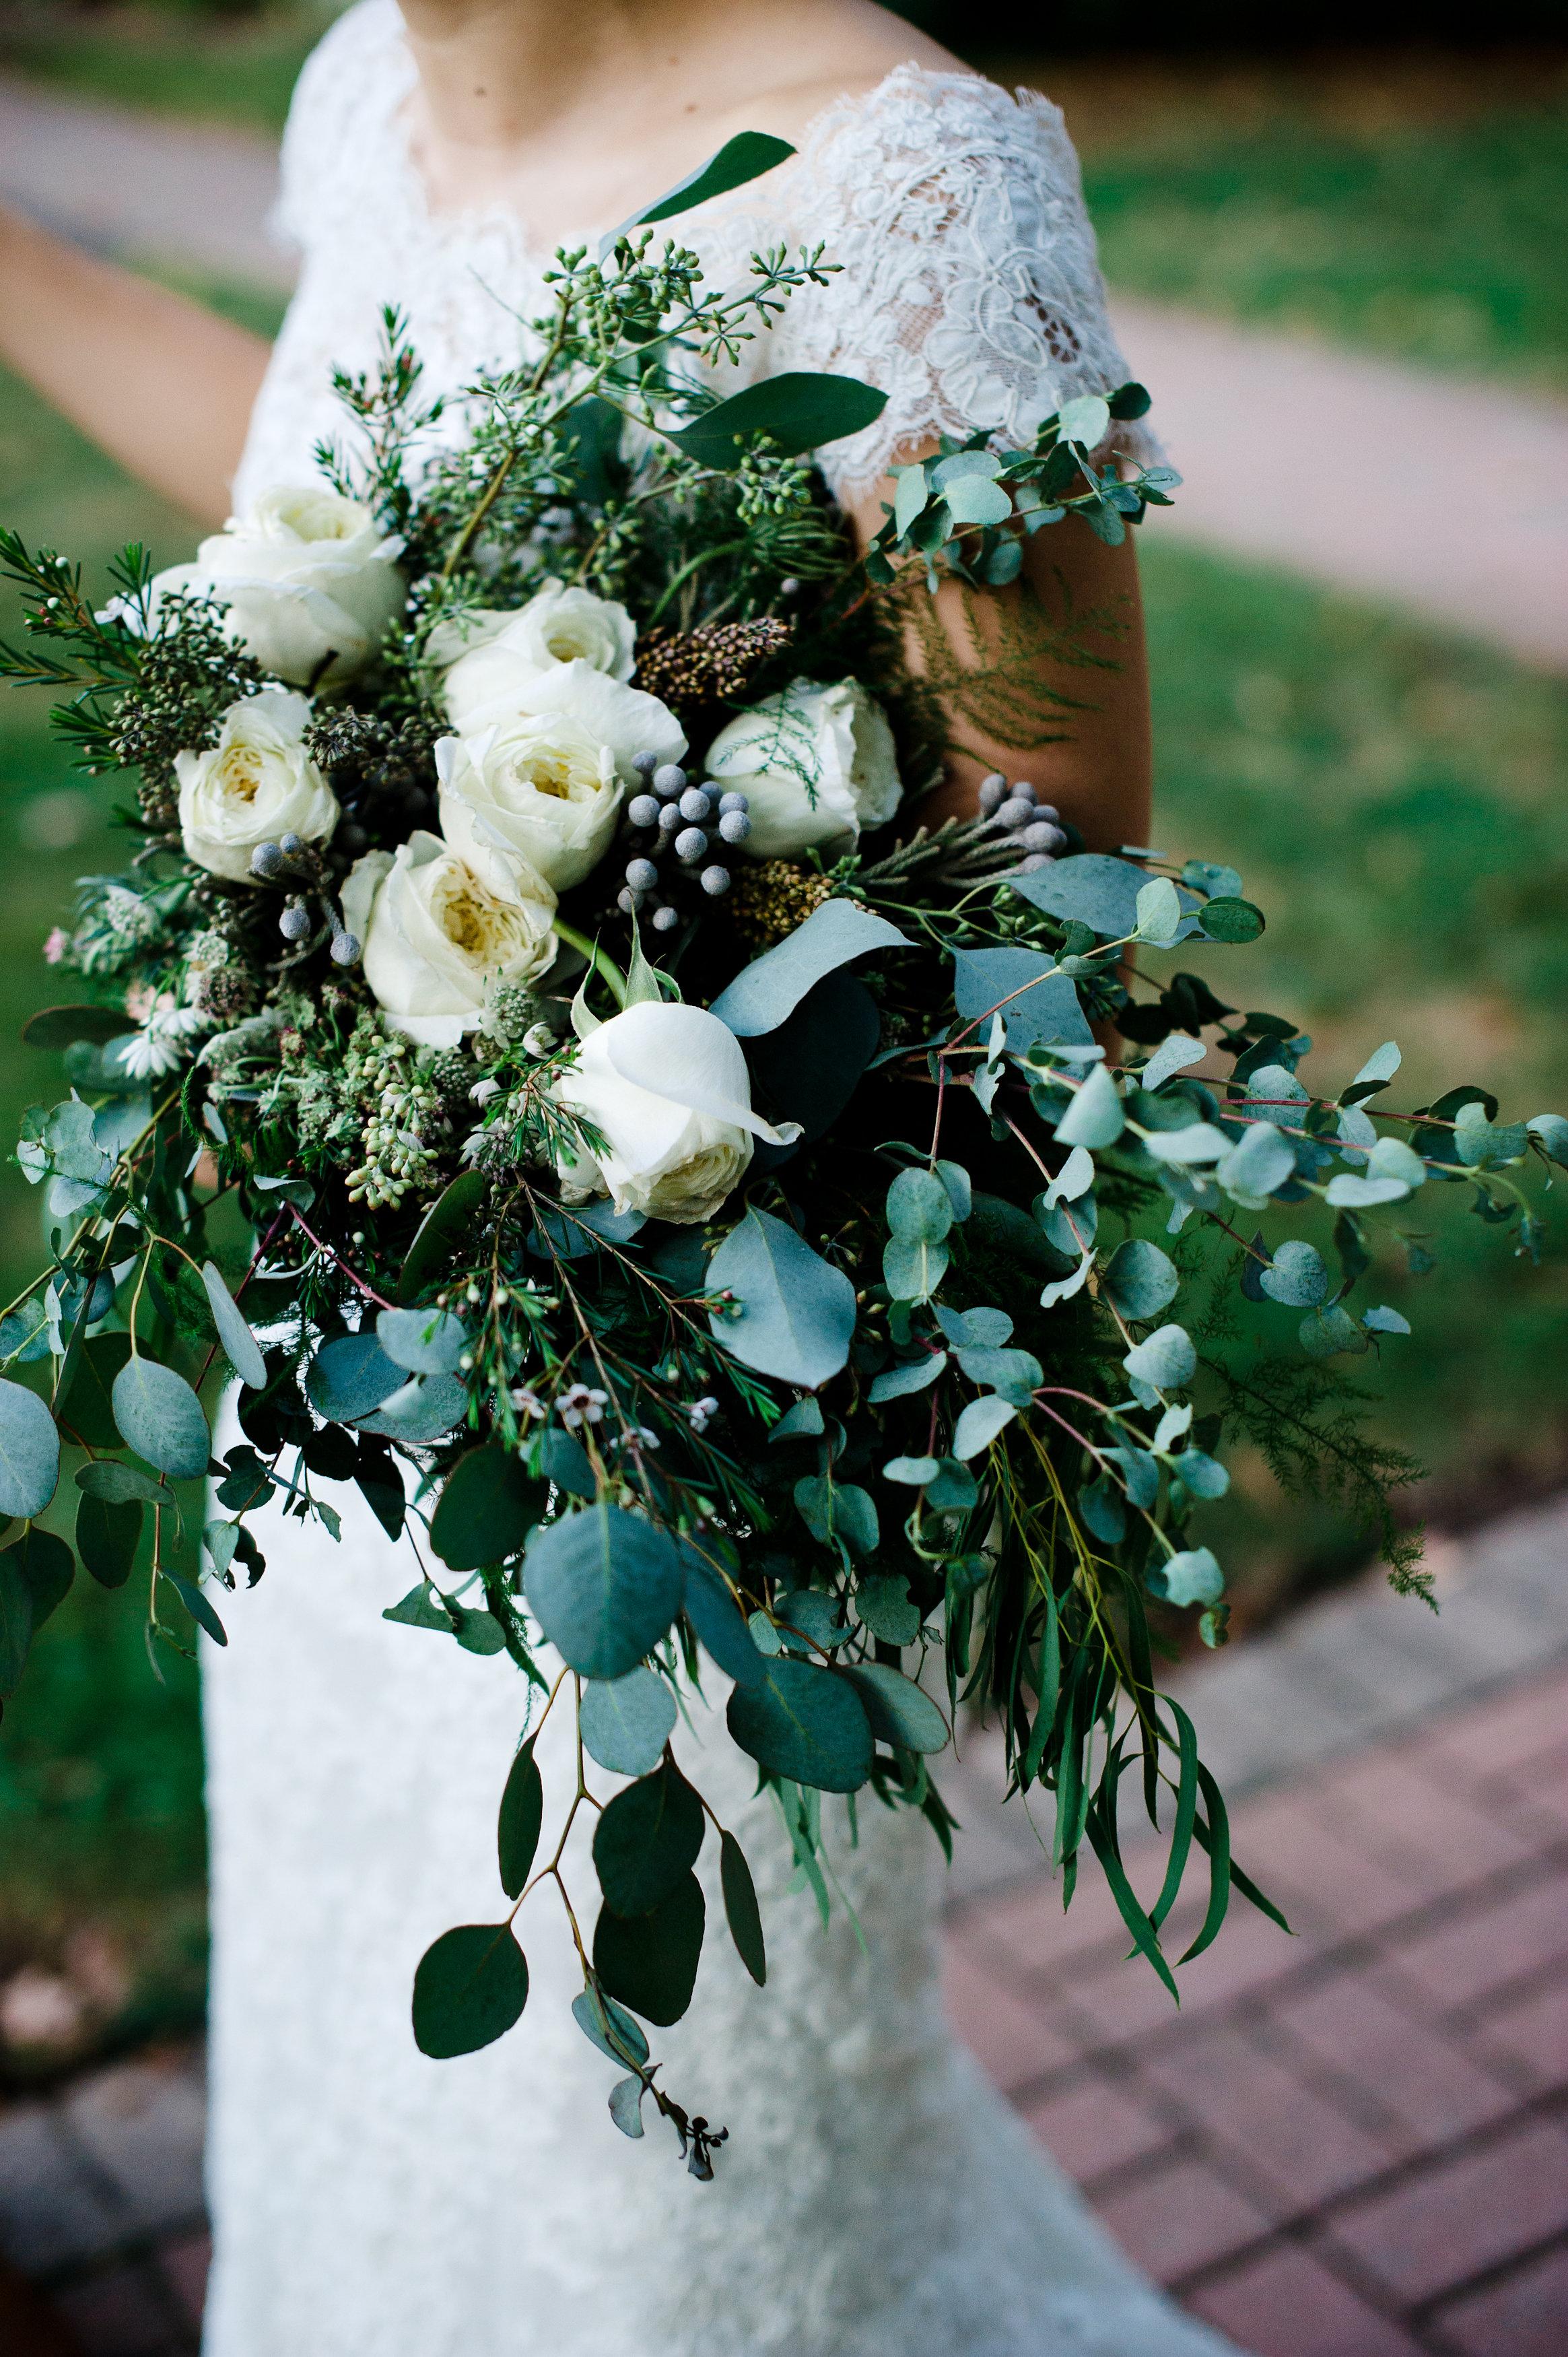 olivia matthew connecticut wedding wedding flowers decor klw design. Black Bedroom Furniture Sets. Home Design Ideas